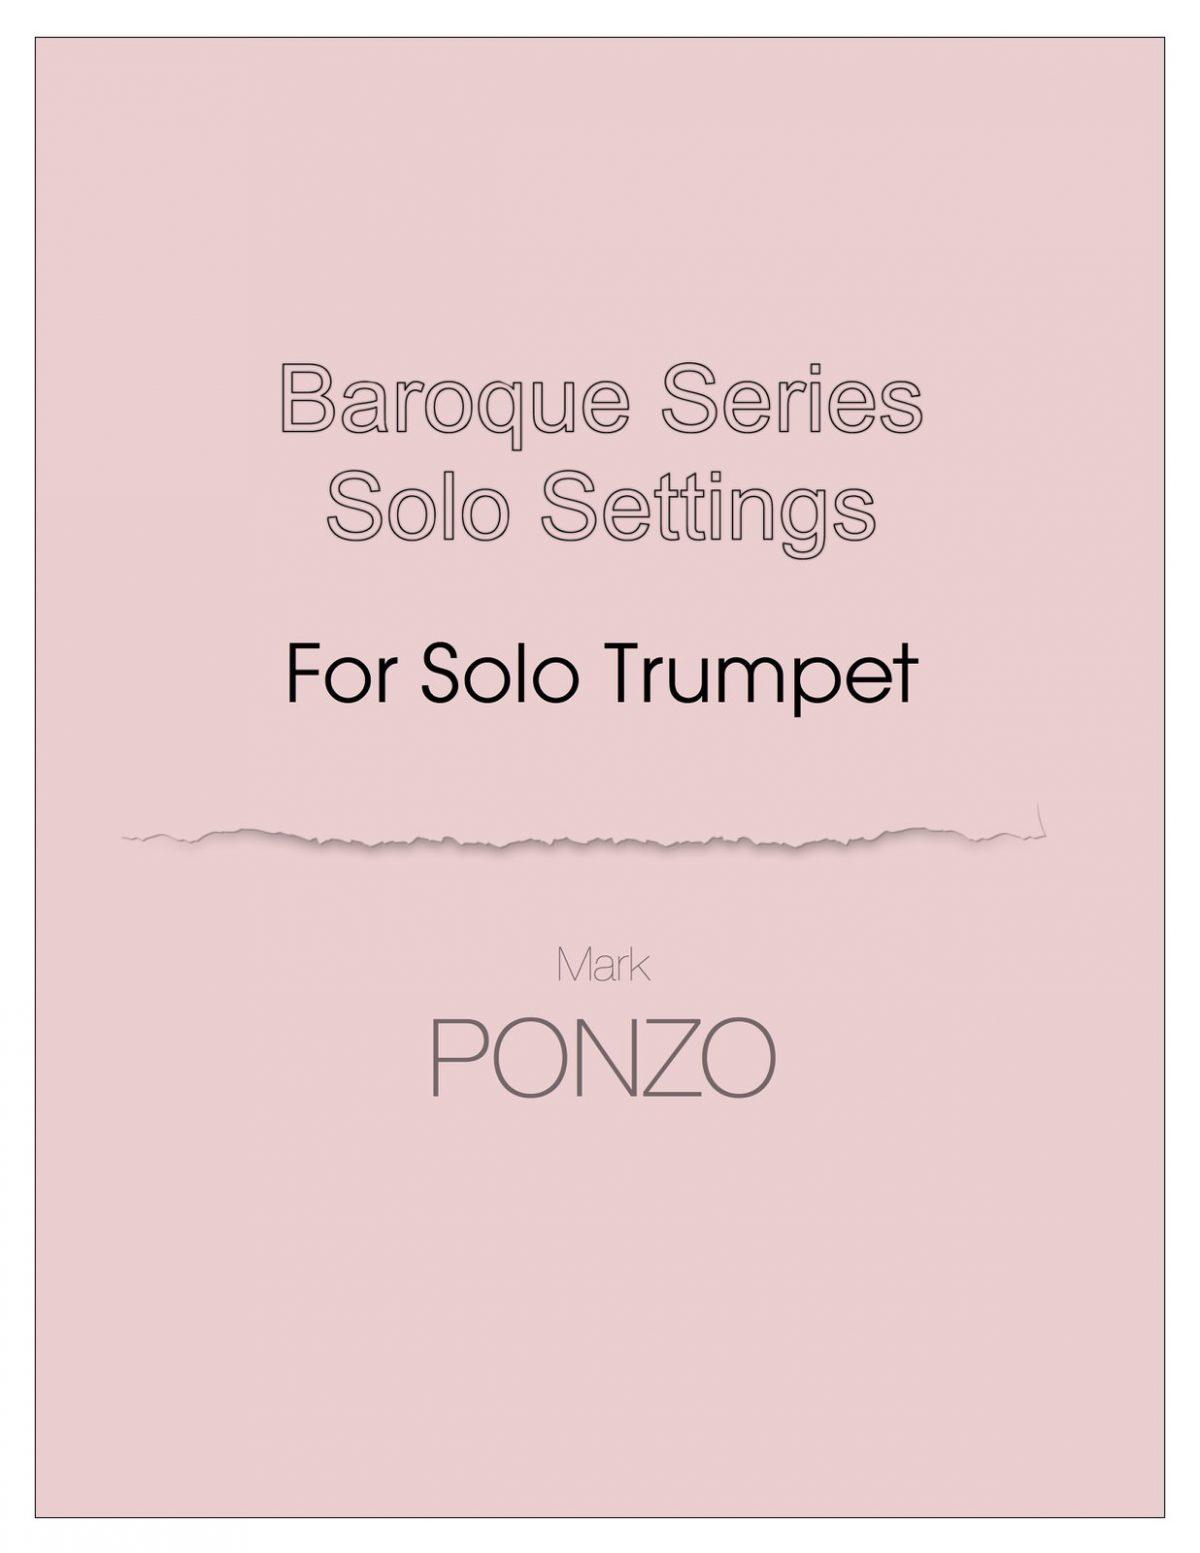 Ponzo, Baroque Series for Unaccompanied Trumpet-p01